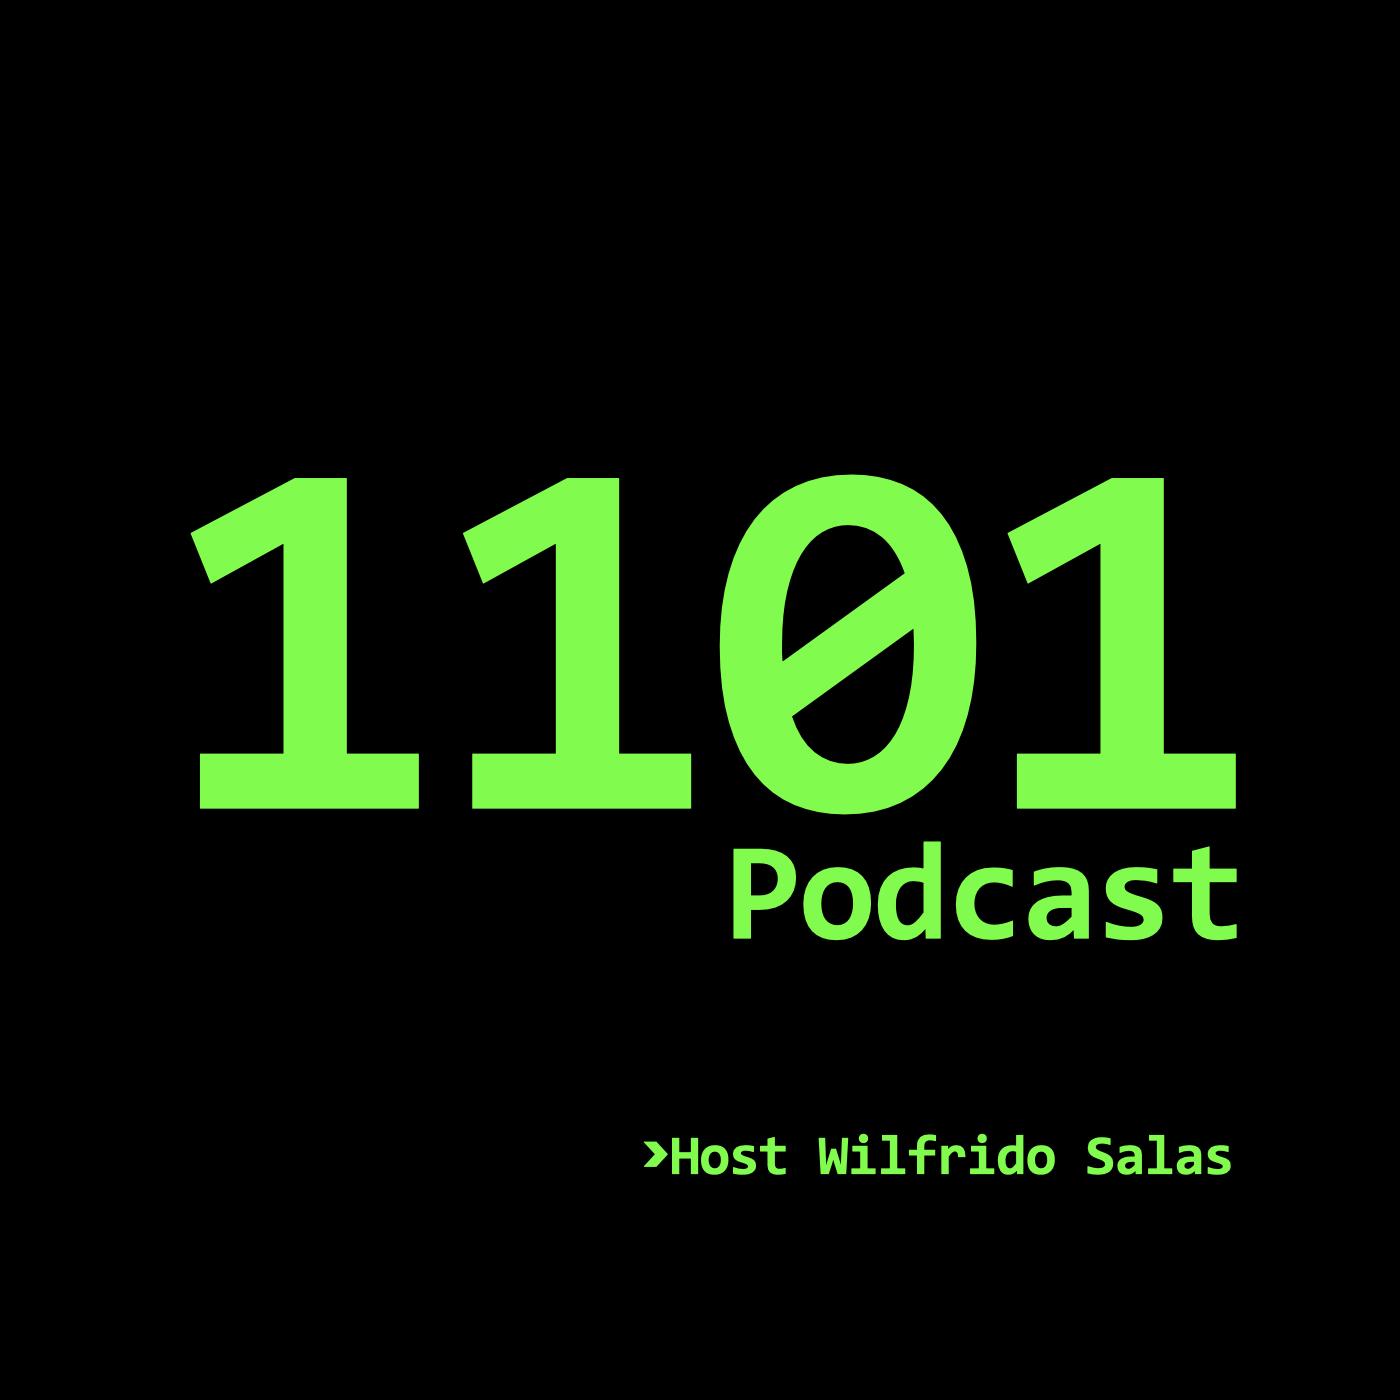 1101 podcast